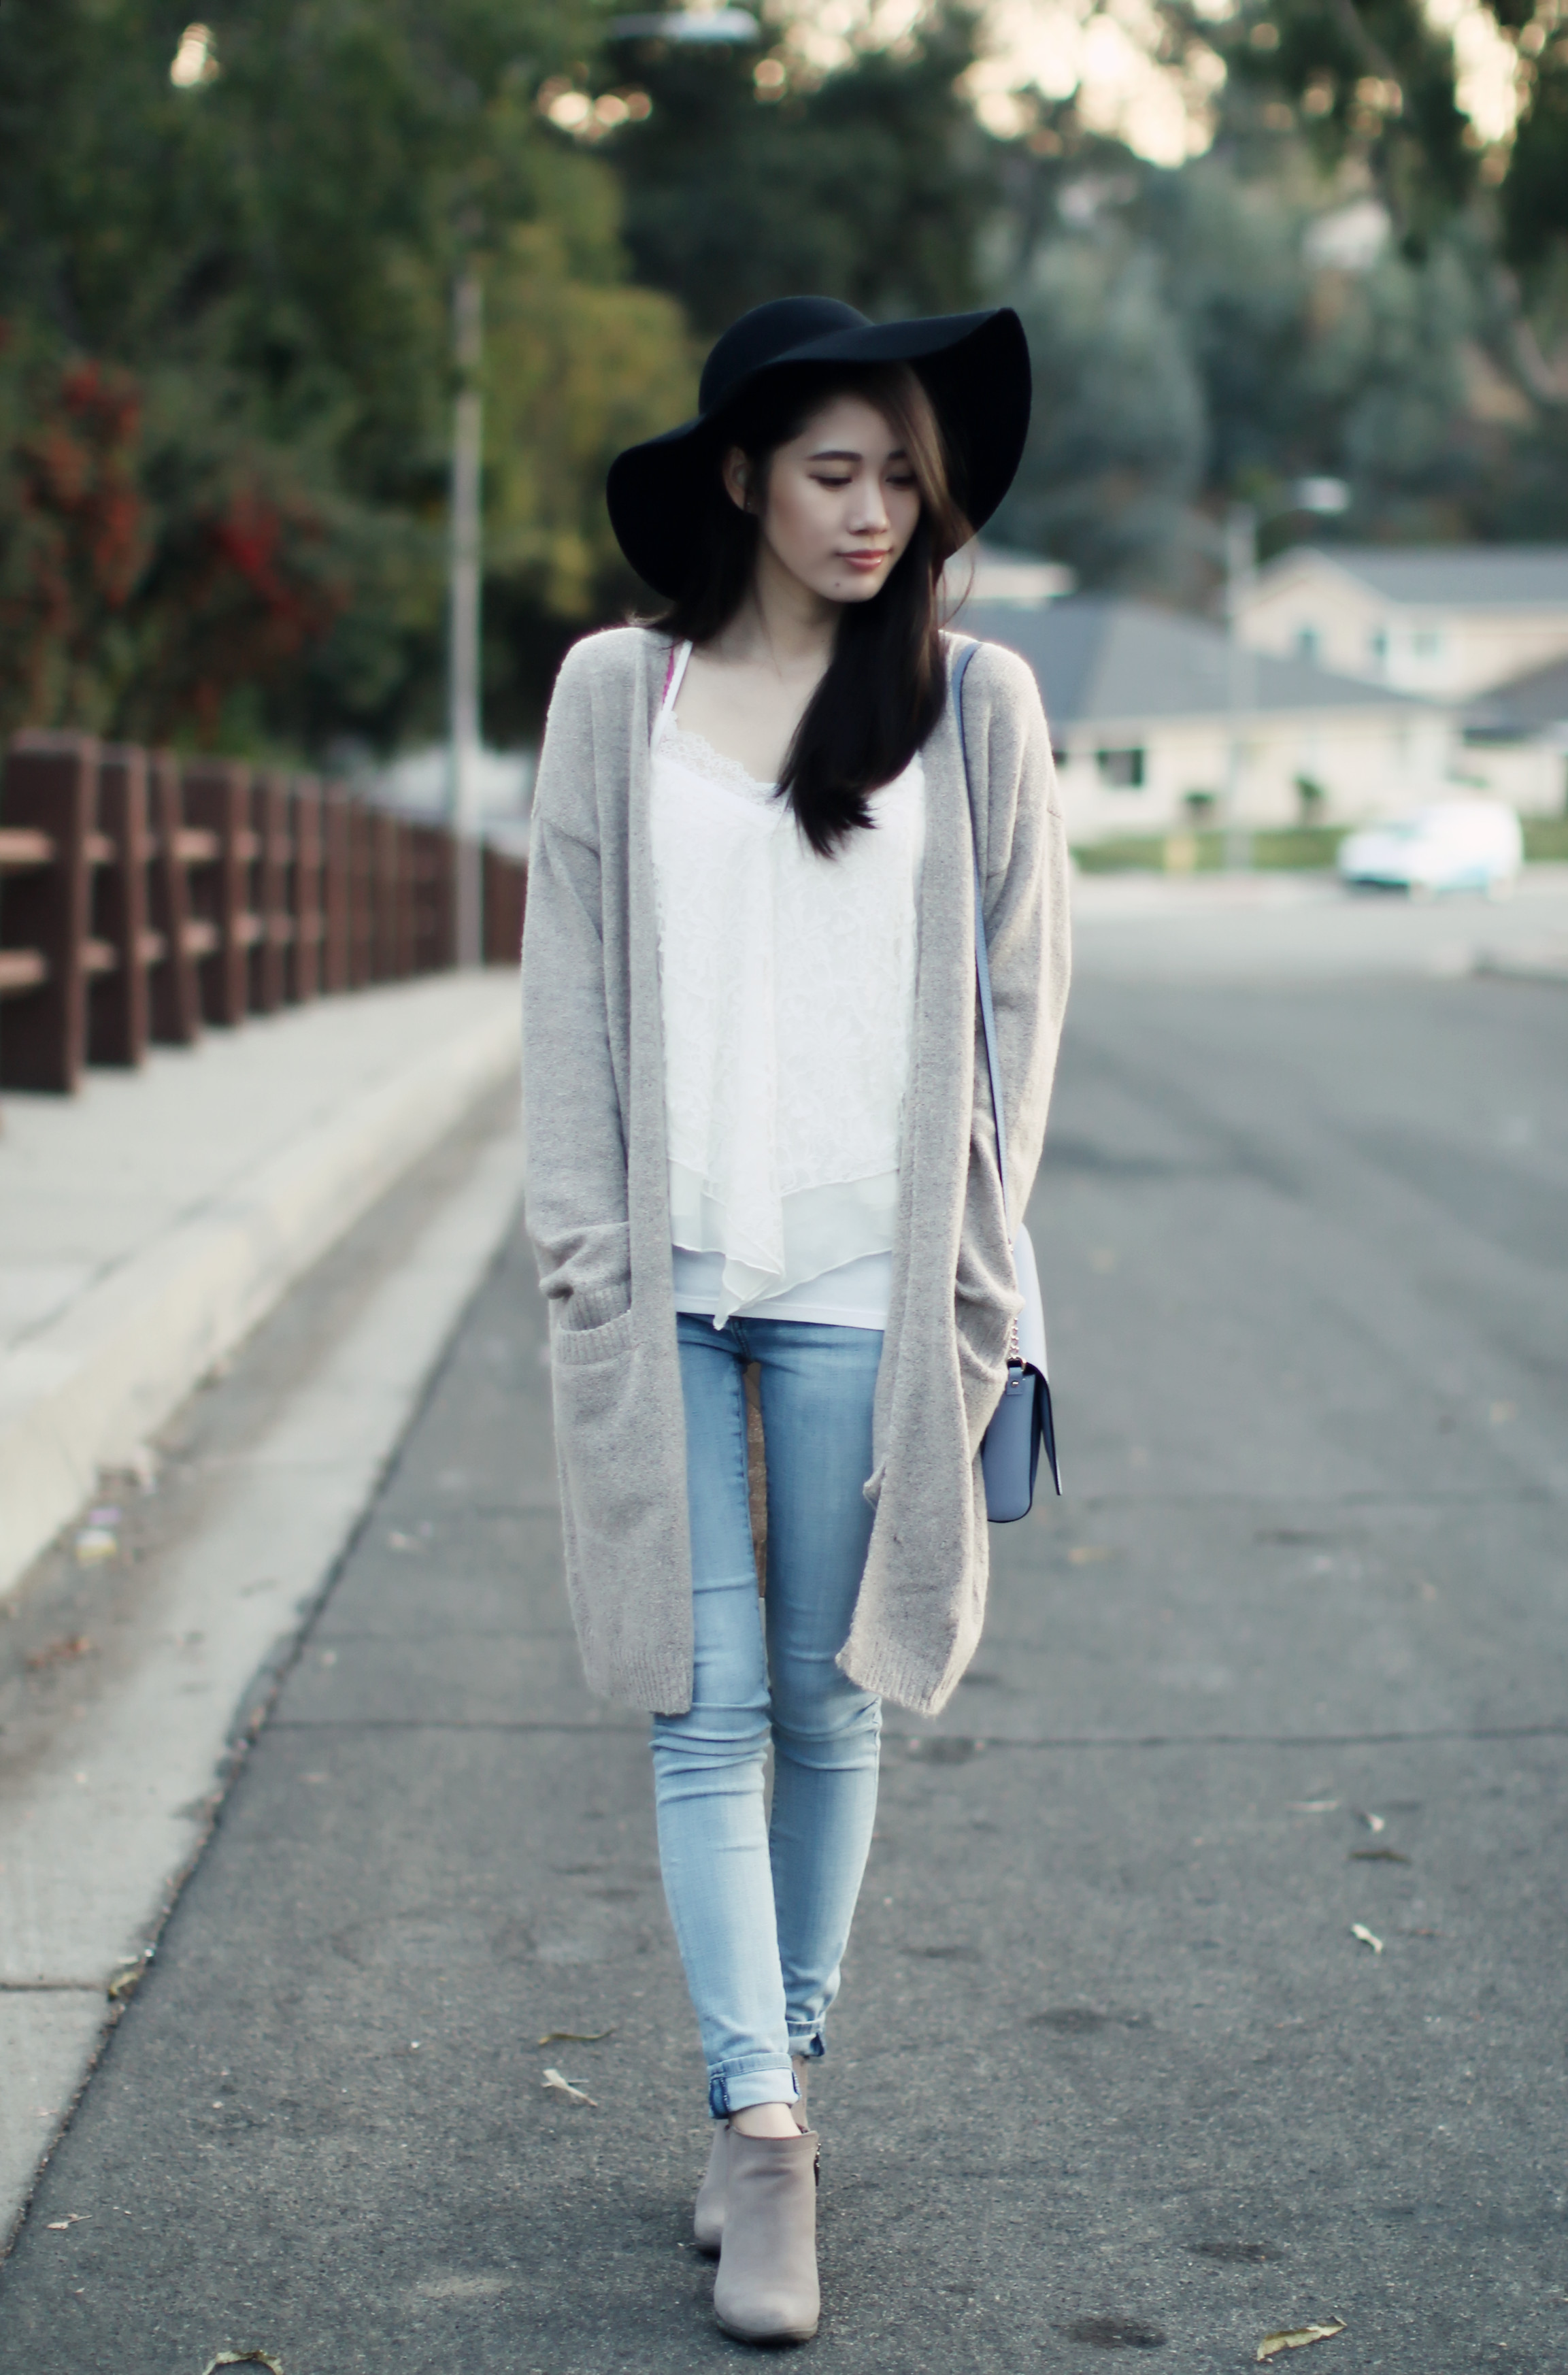 3837-ootd-fashion-style-outfitoftheday-wiwt-nordstrom-abercrombie-bohemian-fallfashion-forever21-f21-f21xme-koreanfashion-elizabeeetht-clothestoyouuu